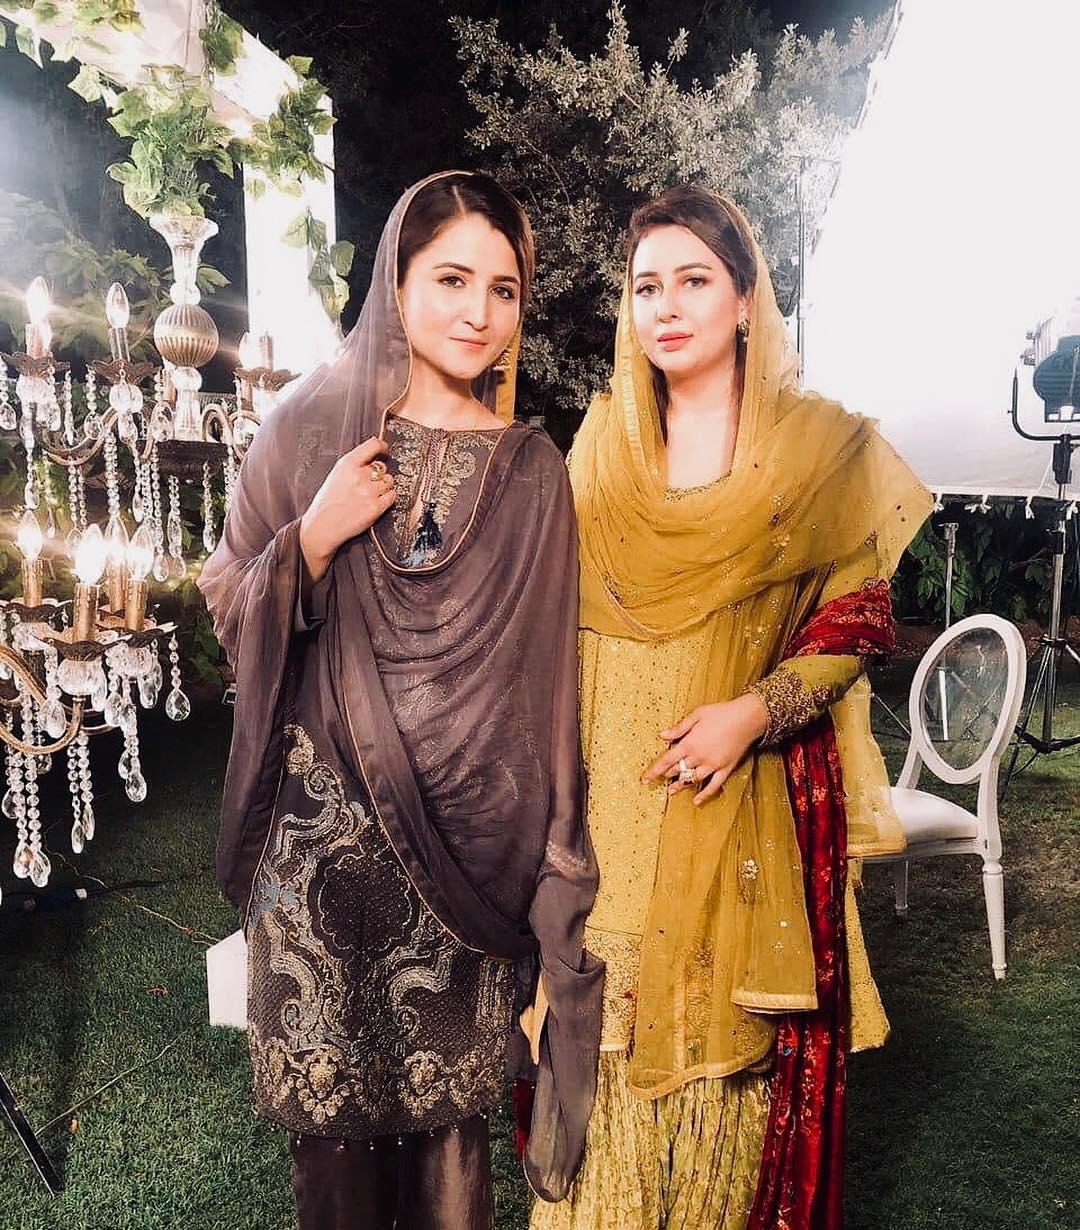 Anchors Rabia Anum and Neelum Usaf on set of Ramzan Transmission